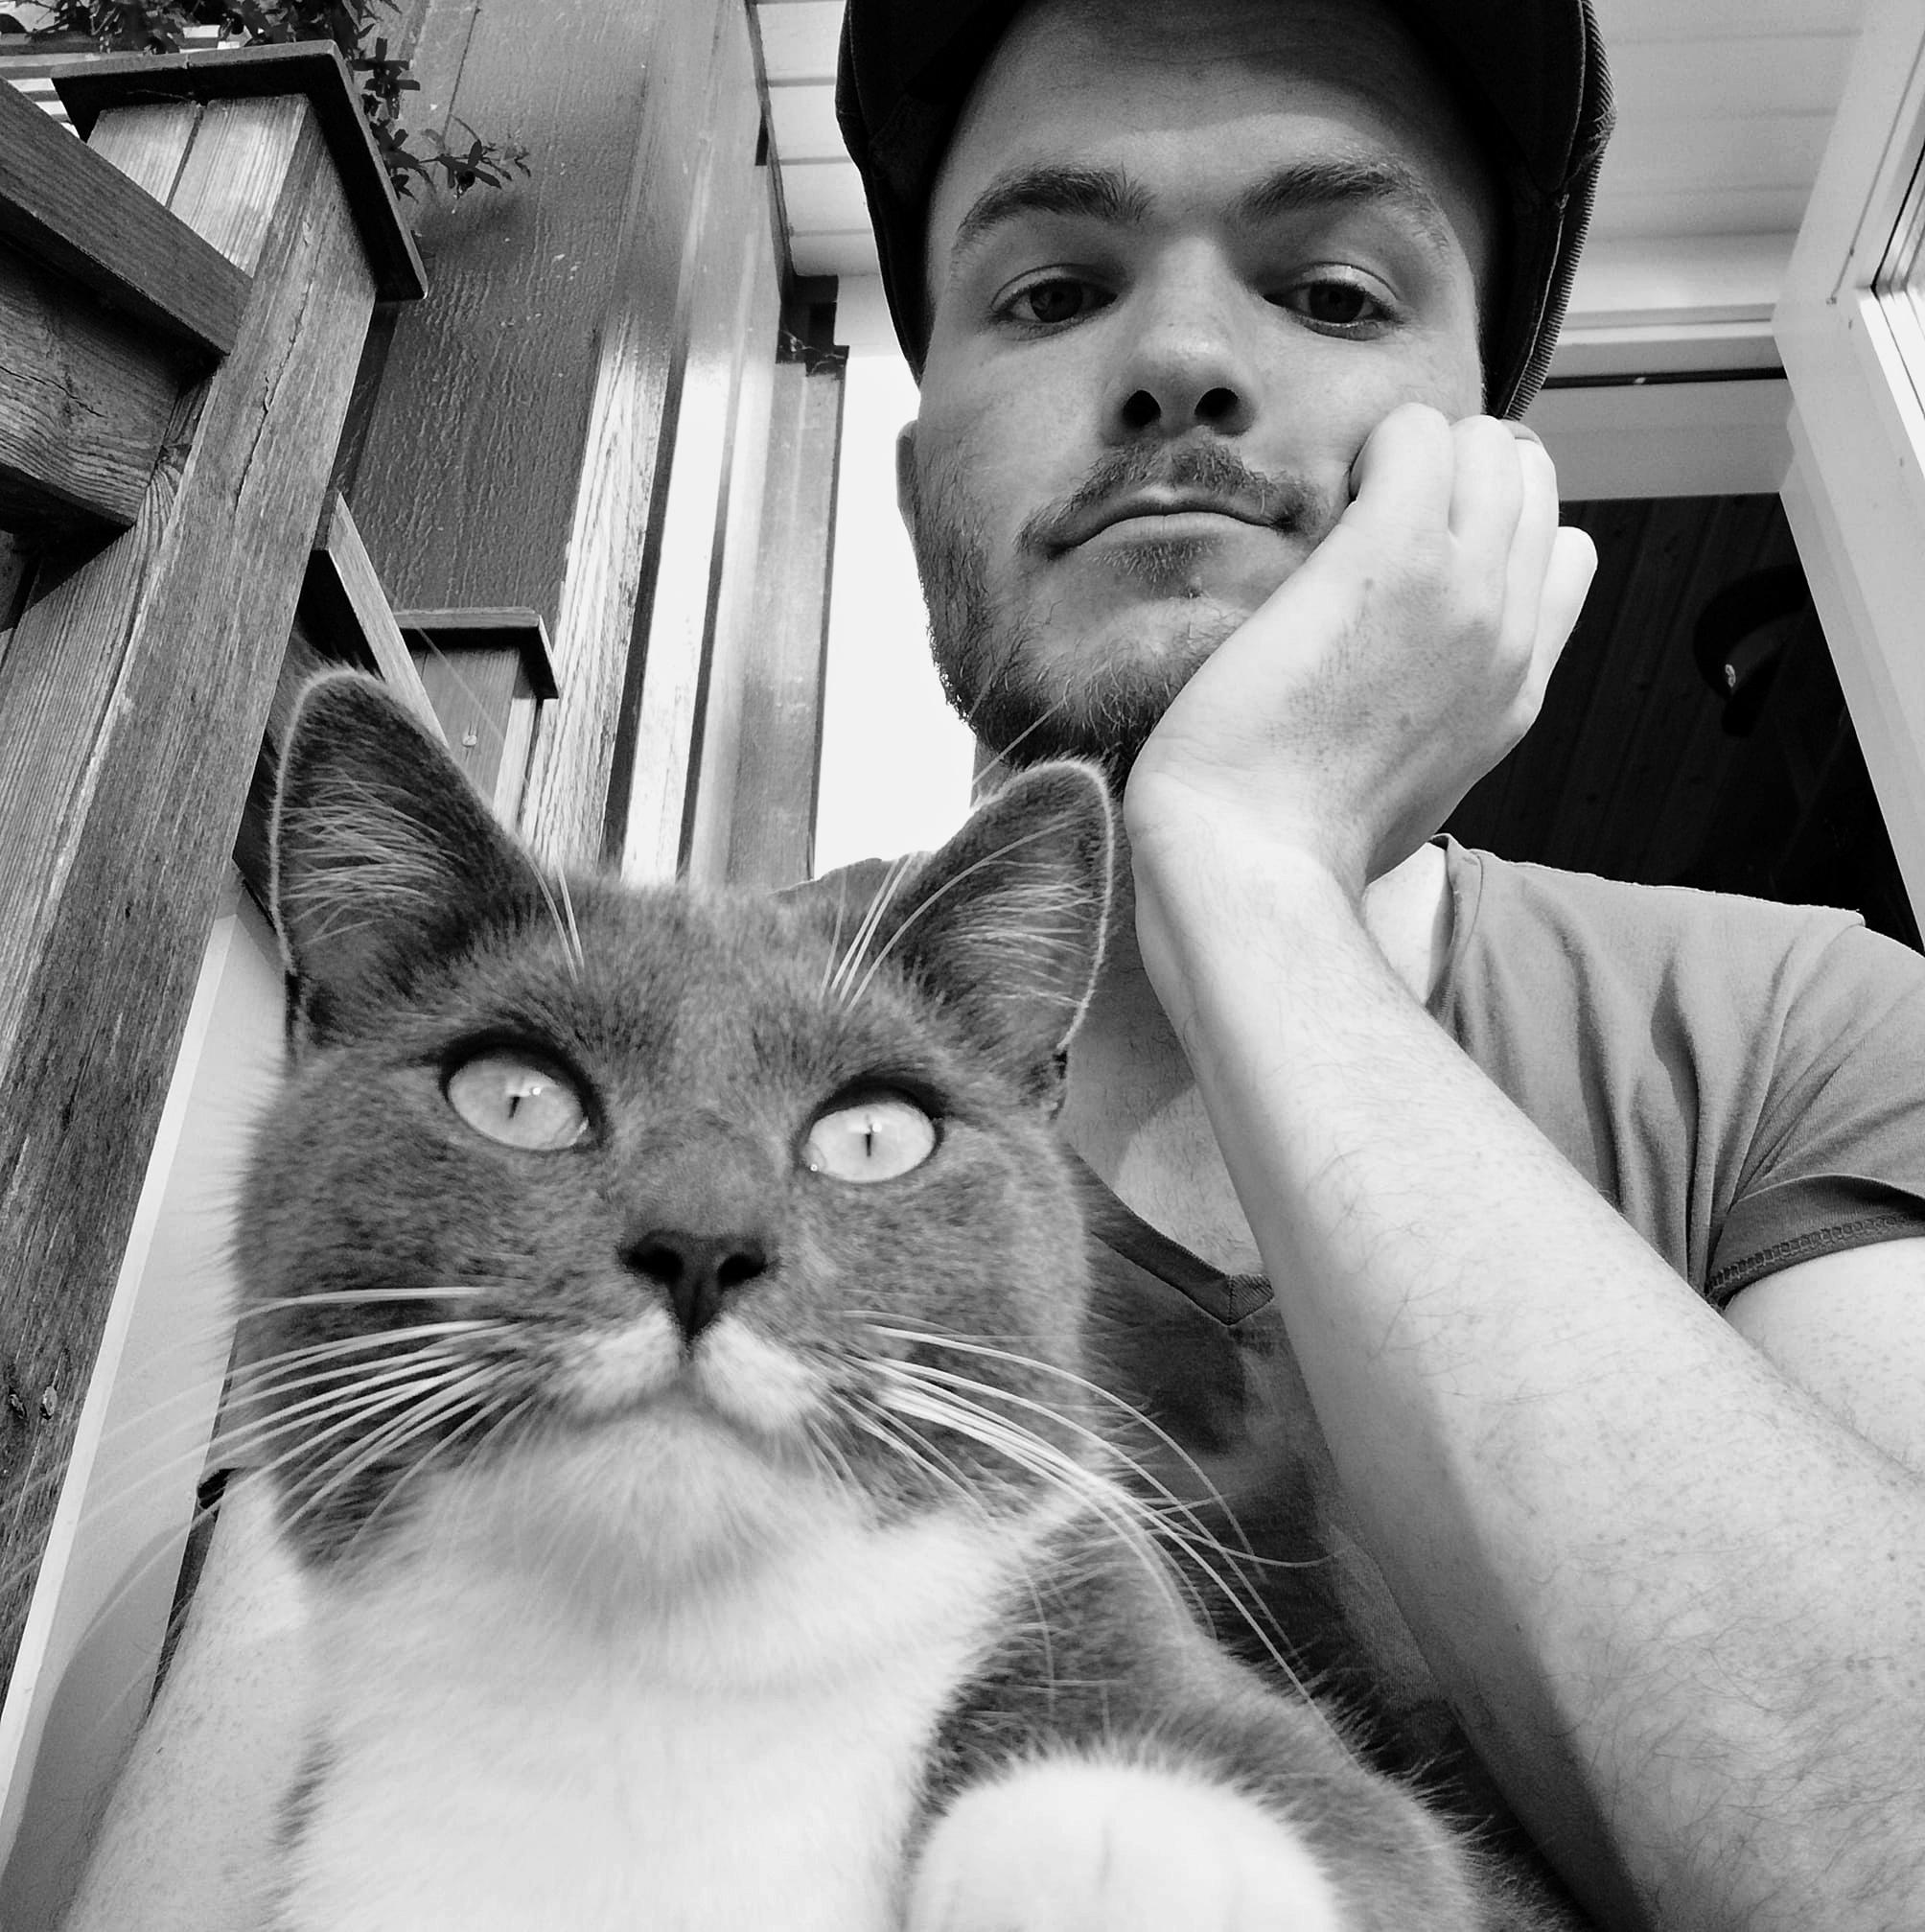 Tony Johansson - Actual math scientist. Improvises with scientific precision. Lover of cats.